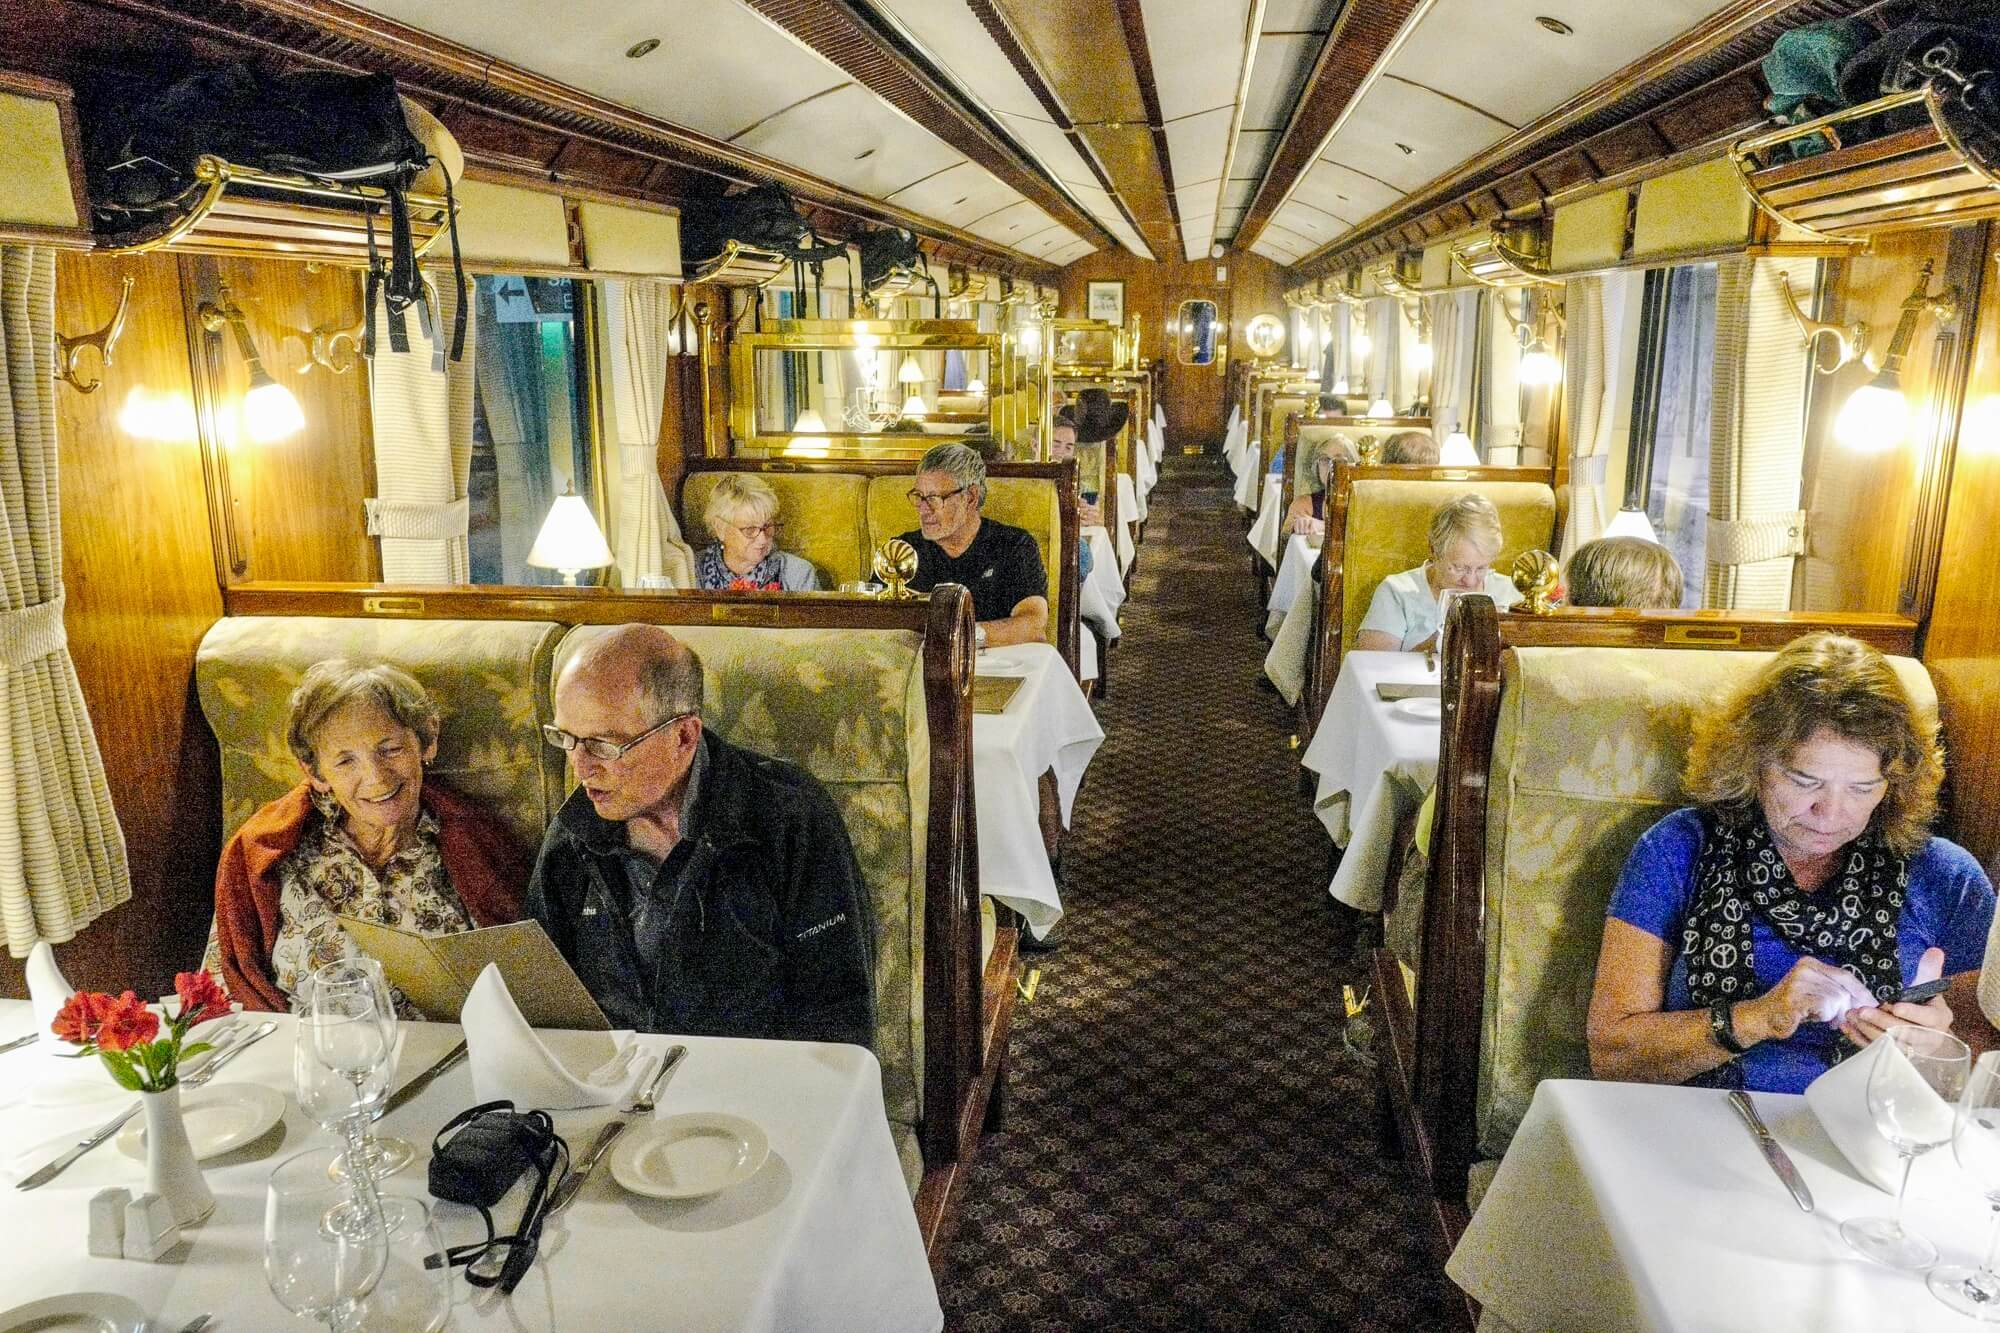 Dining Car at the Hiram Bingham Train between Aguas Calientes and Cusco, Peru